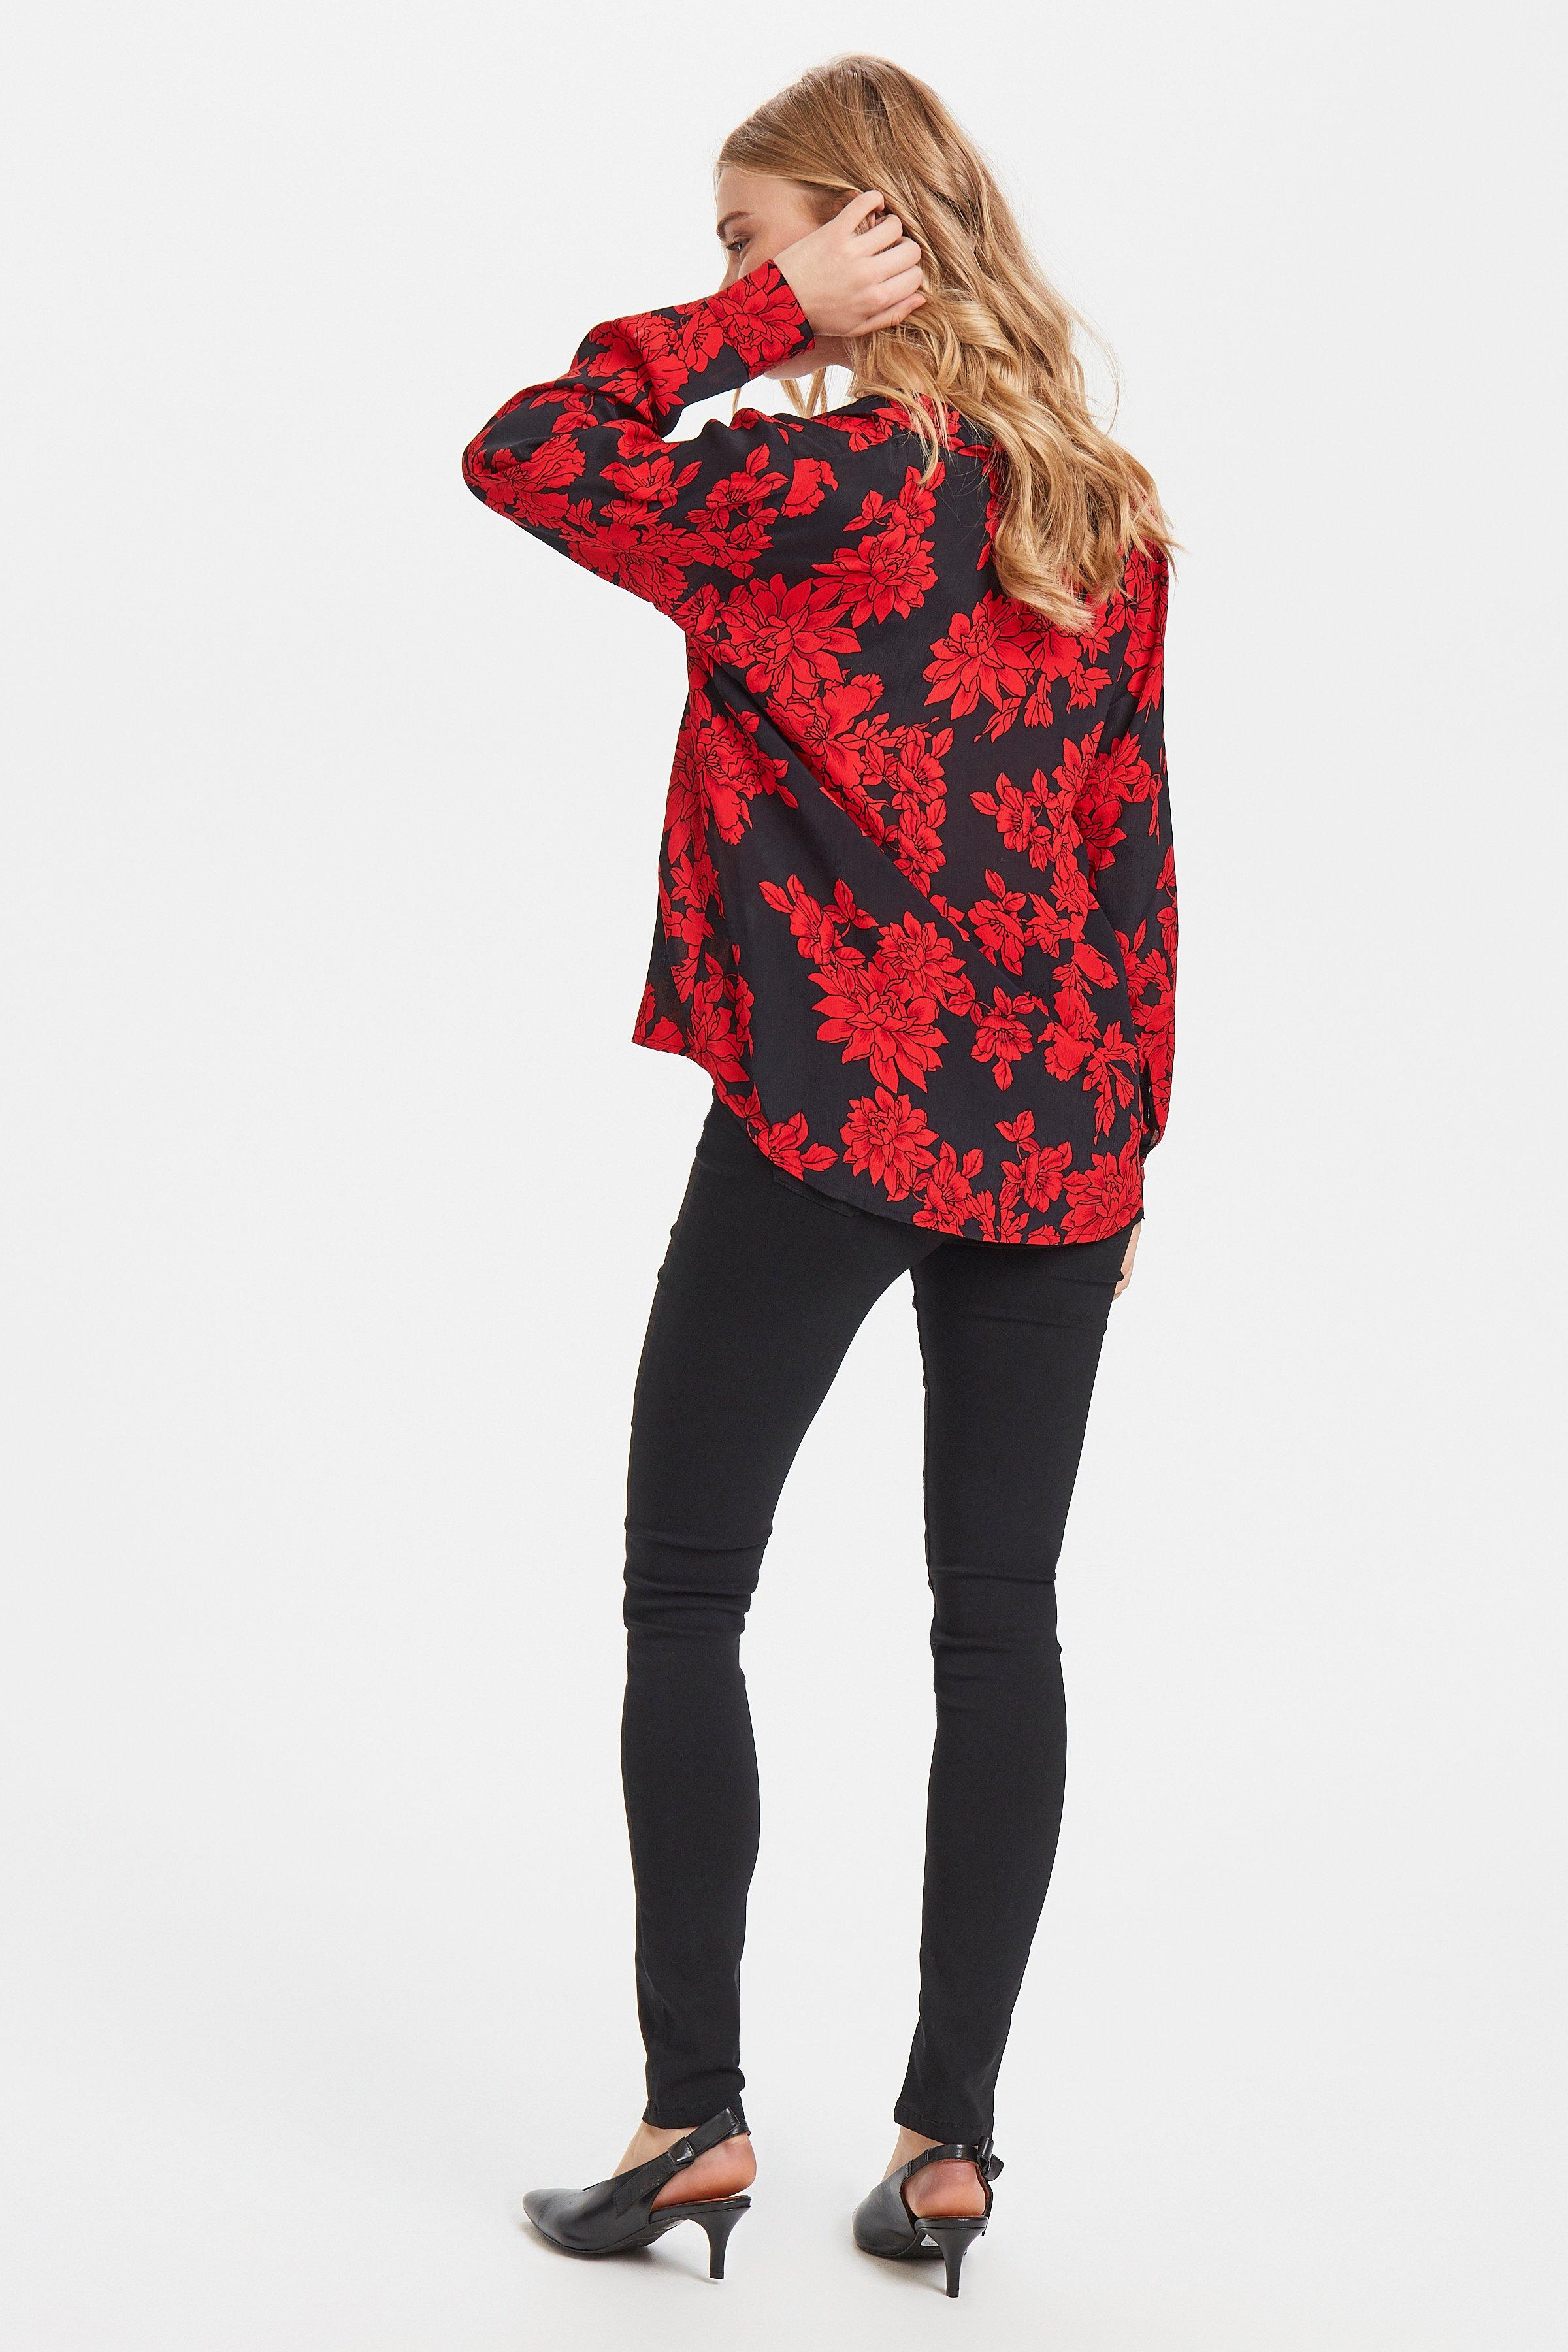 Black w. red flower Overhemd met lang mouwen van b.young – Koop Black w. red flower Overhemd met lang mouwen hier van size 36-44